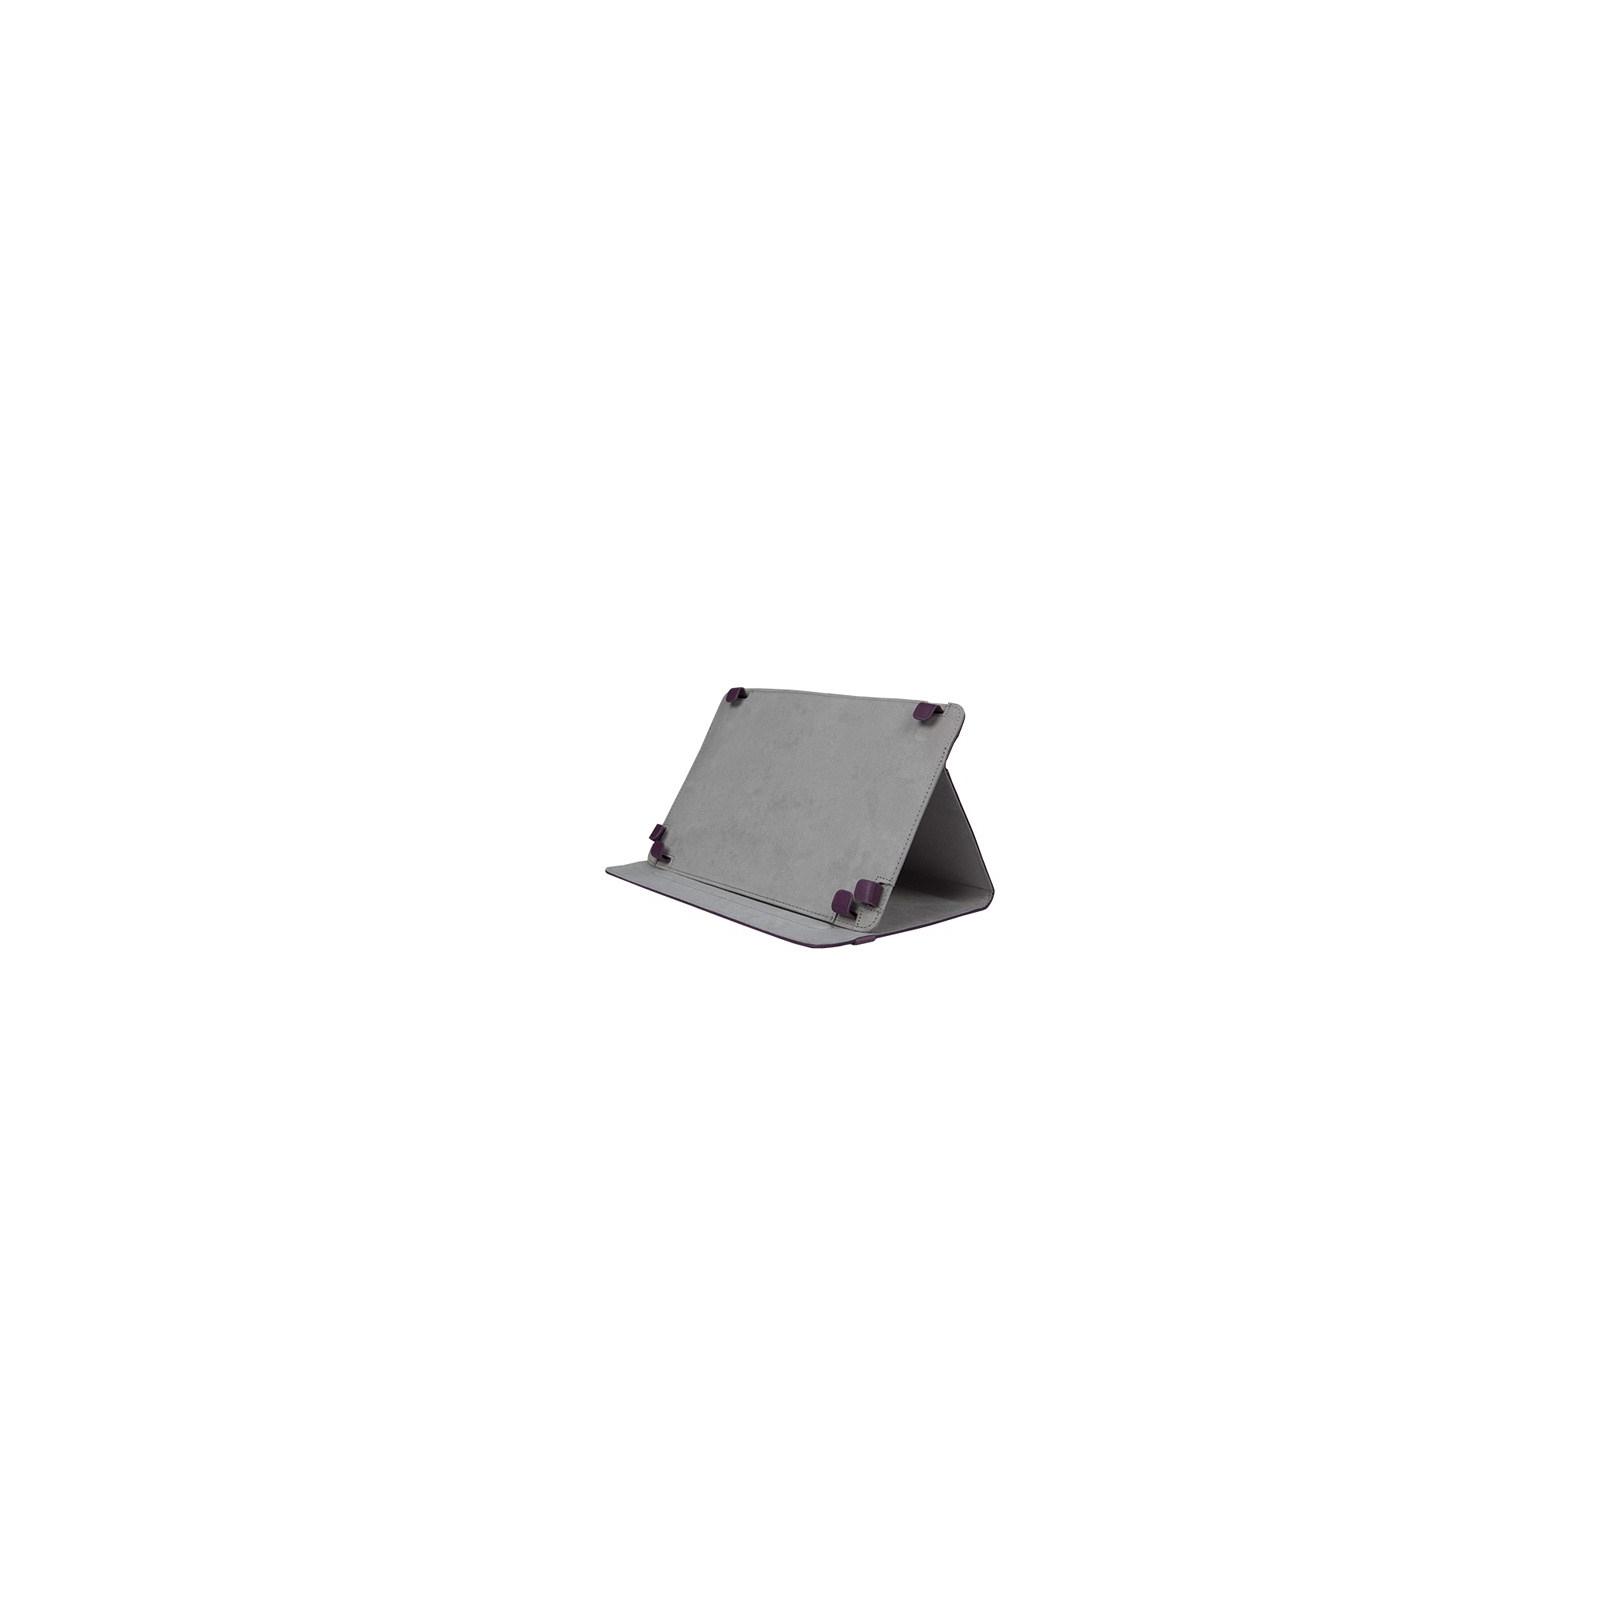 Чехол для планшета Continent 10 Universal (UTH-102VT) изображение 2